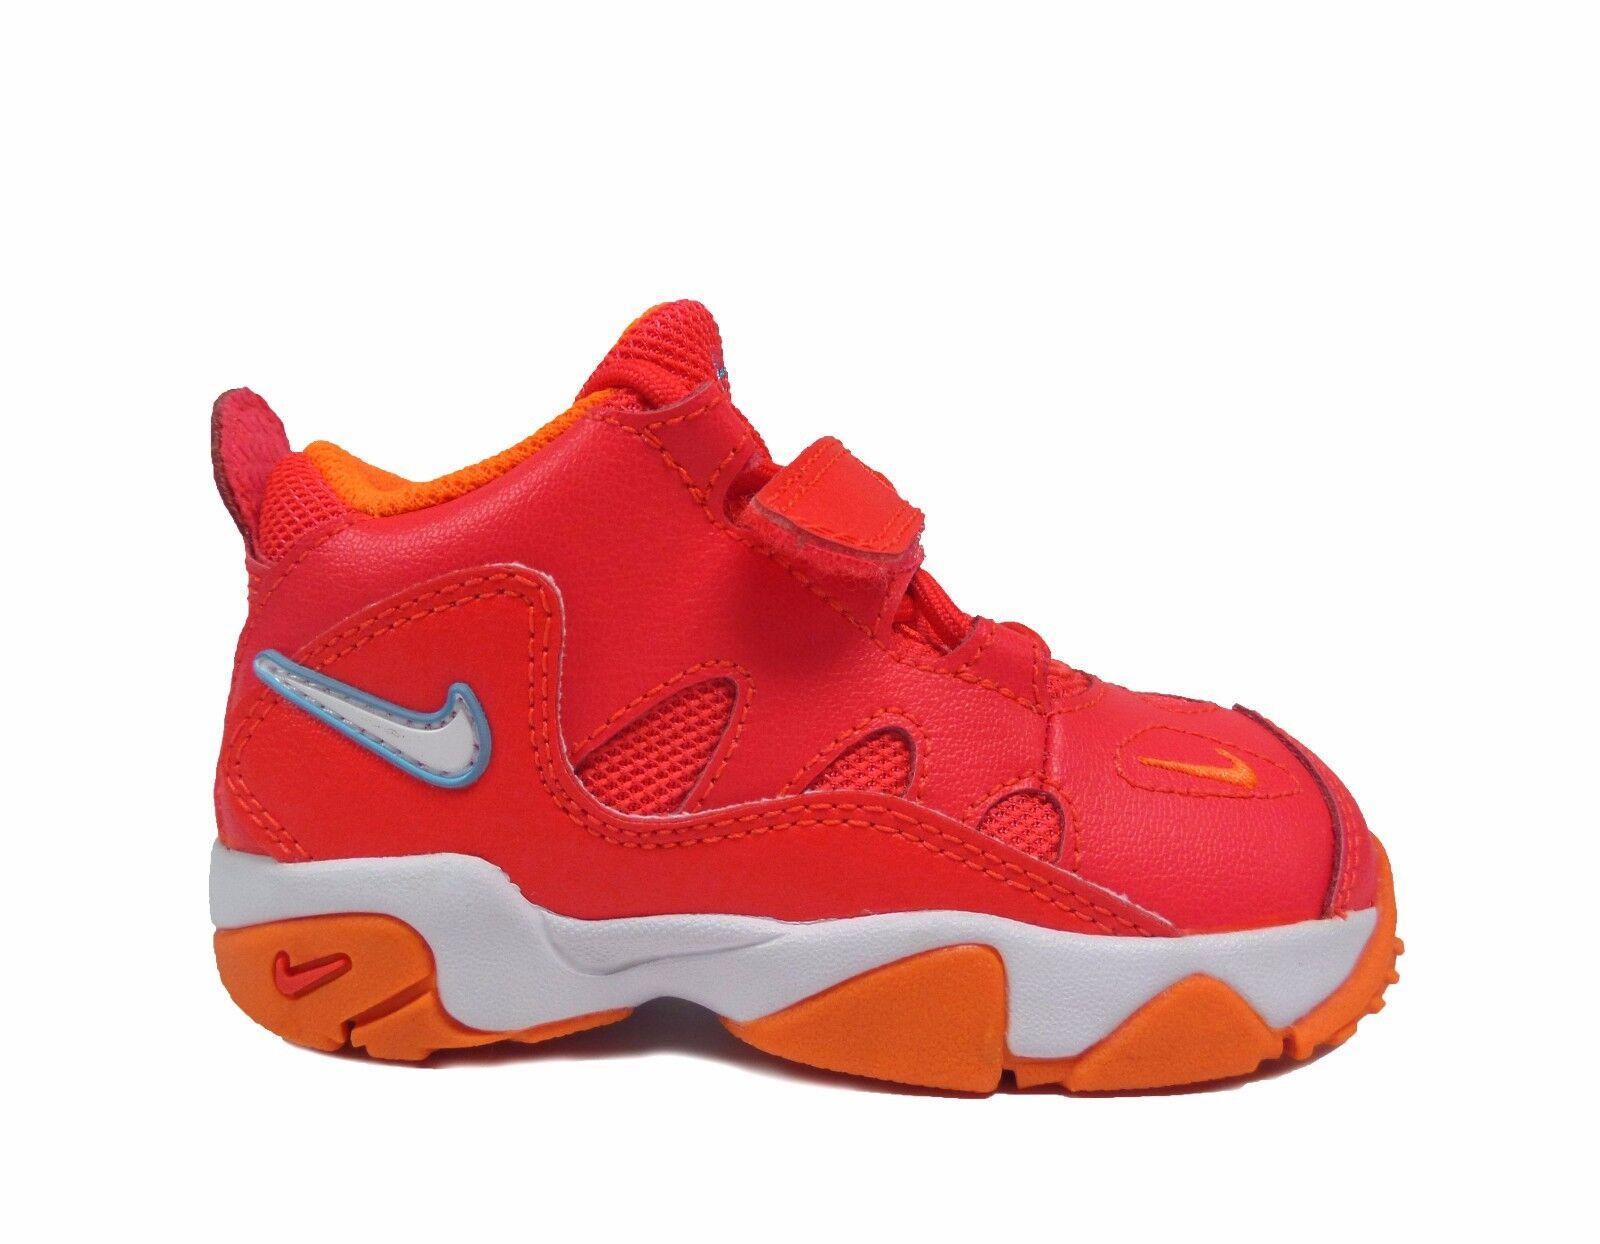 Nike Infant&Toddler AIR TURF RAIDER Shoes Laser Crimson 599815-600 a2